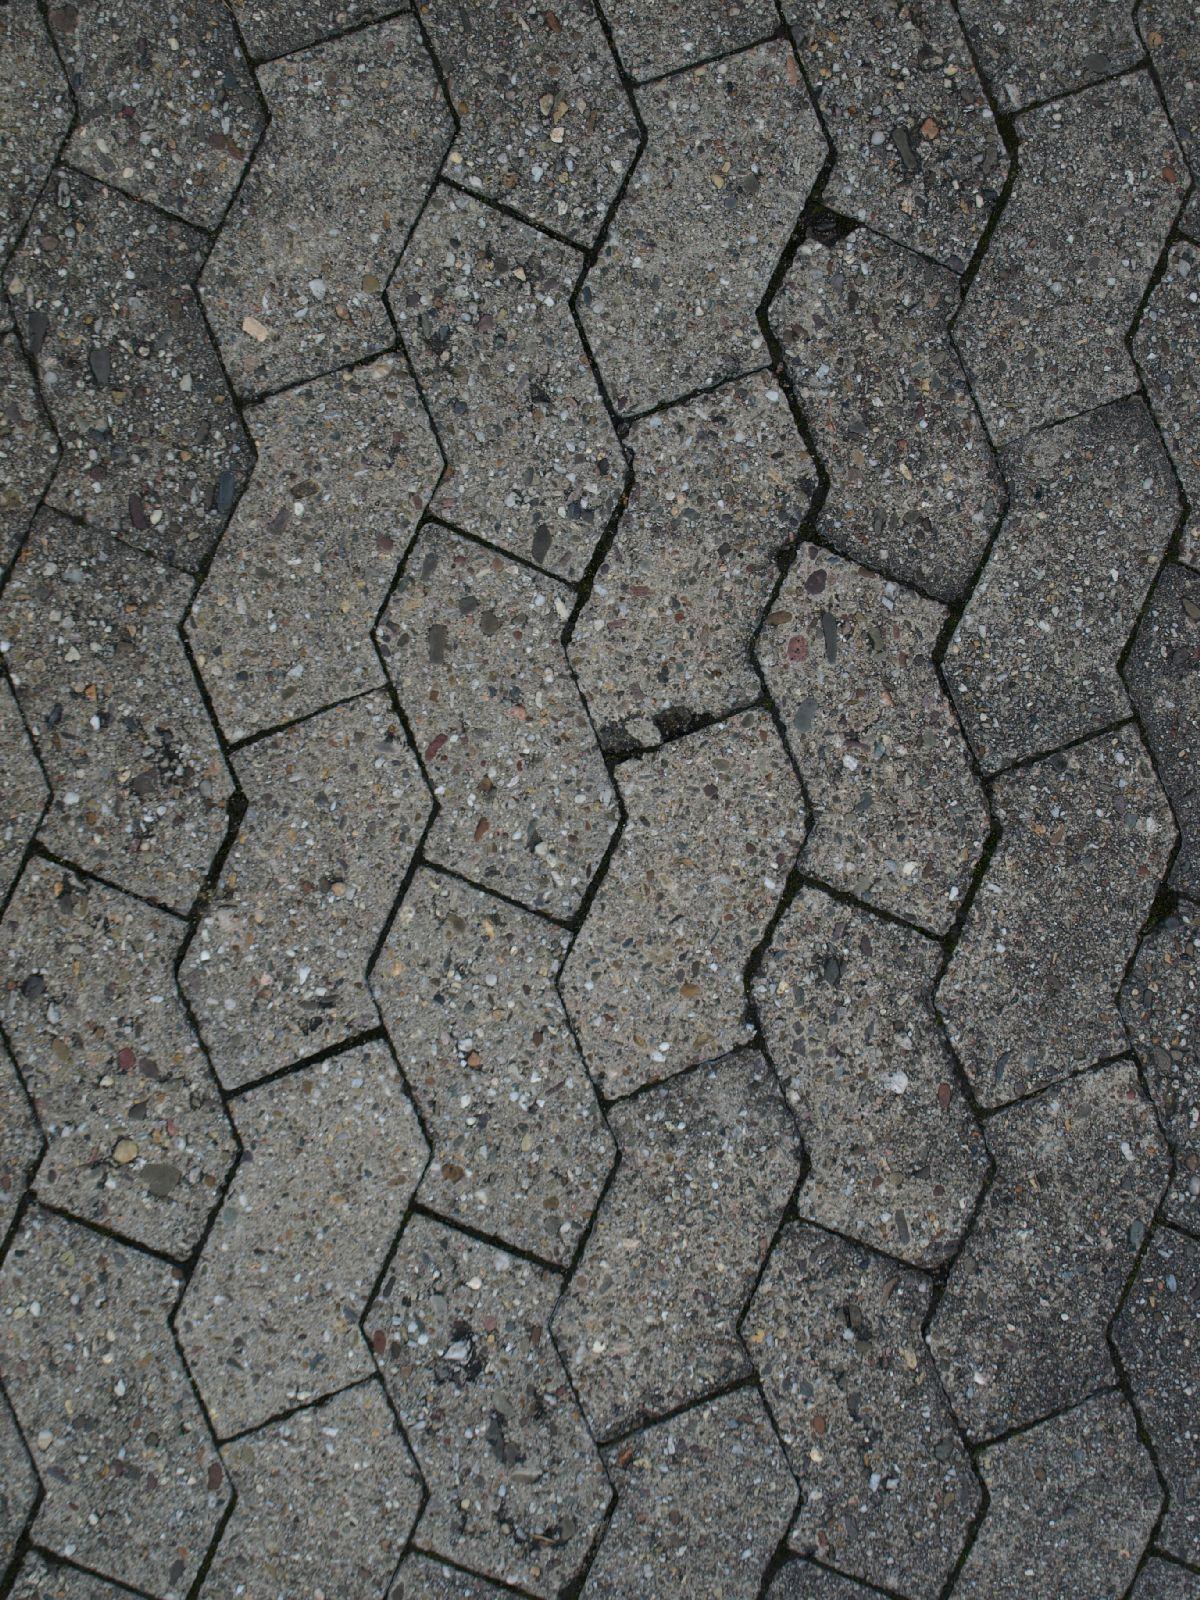 Ground-Urban_Texture_A_PA116024